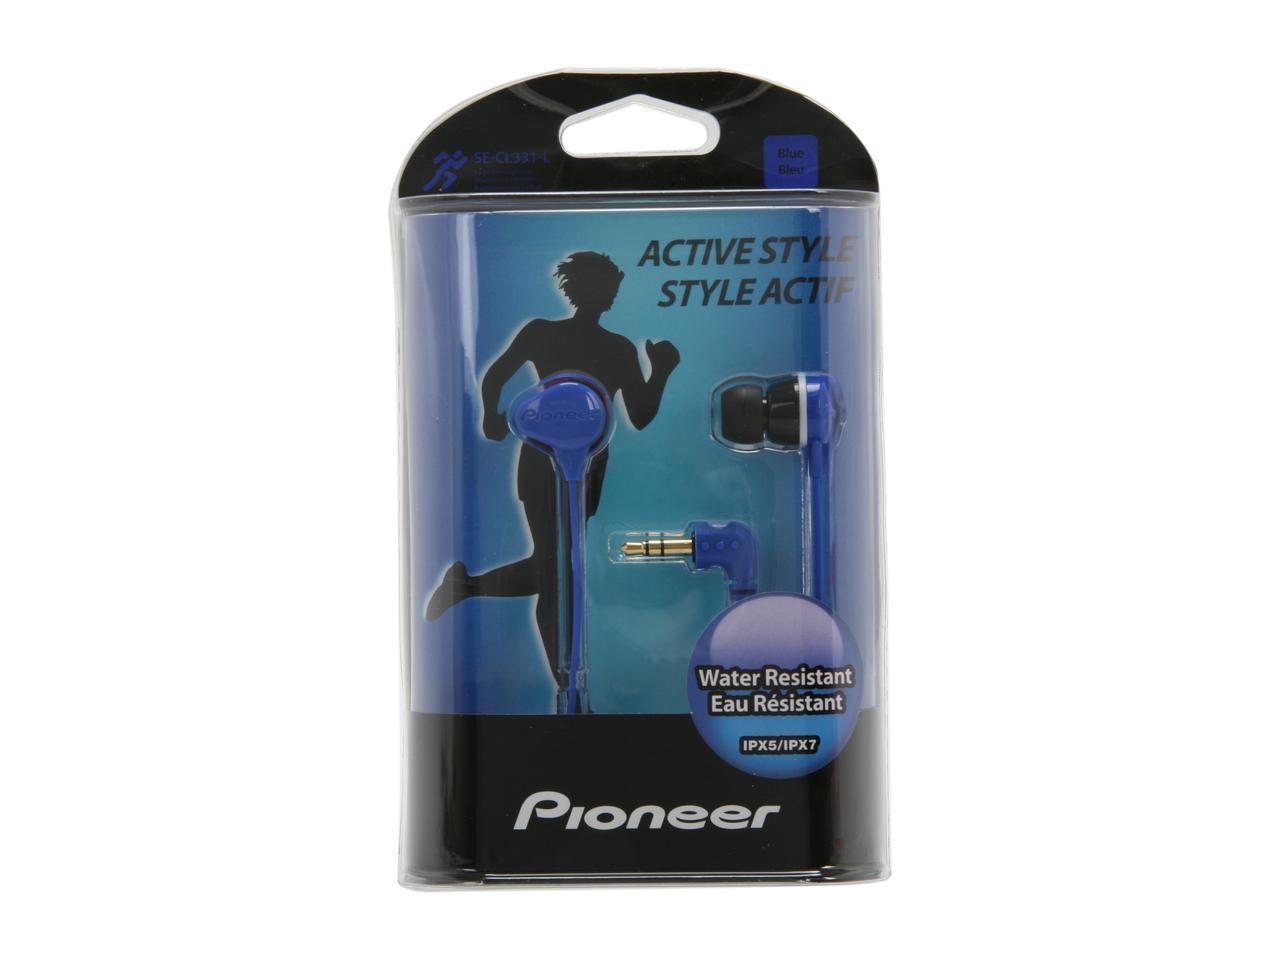 Pioneer Blue SE-CL331-L Canal Water-Resistant Earbud Headphone - $17.49